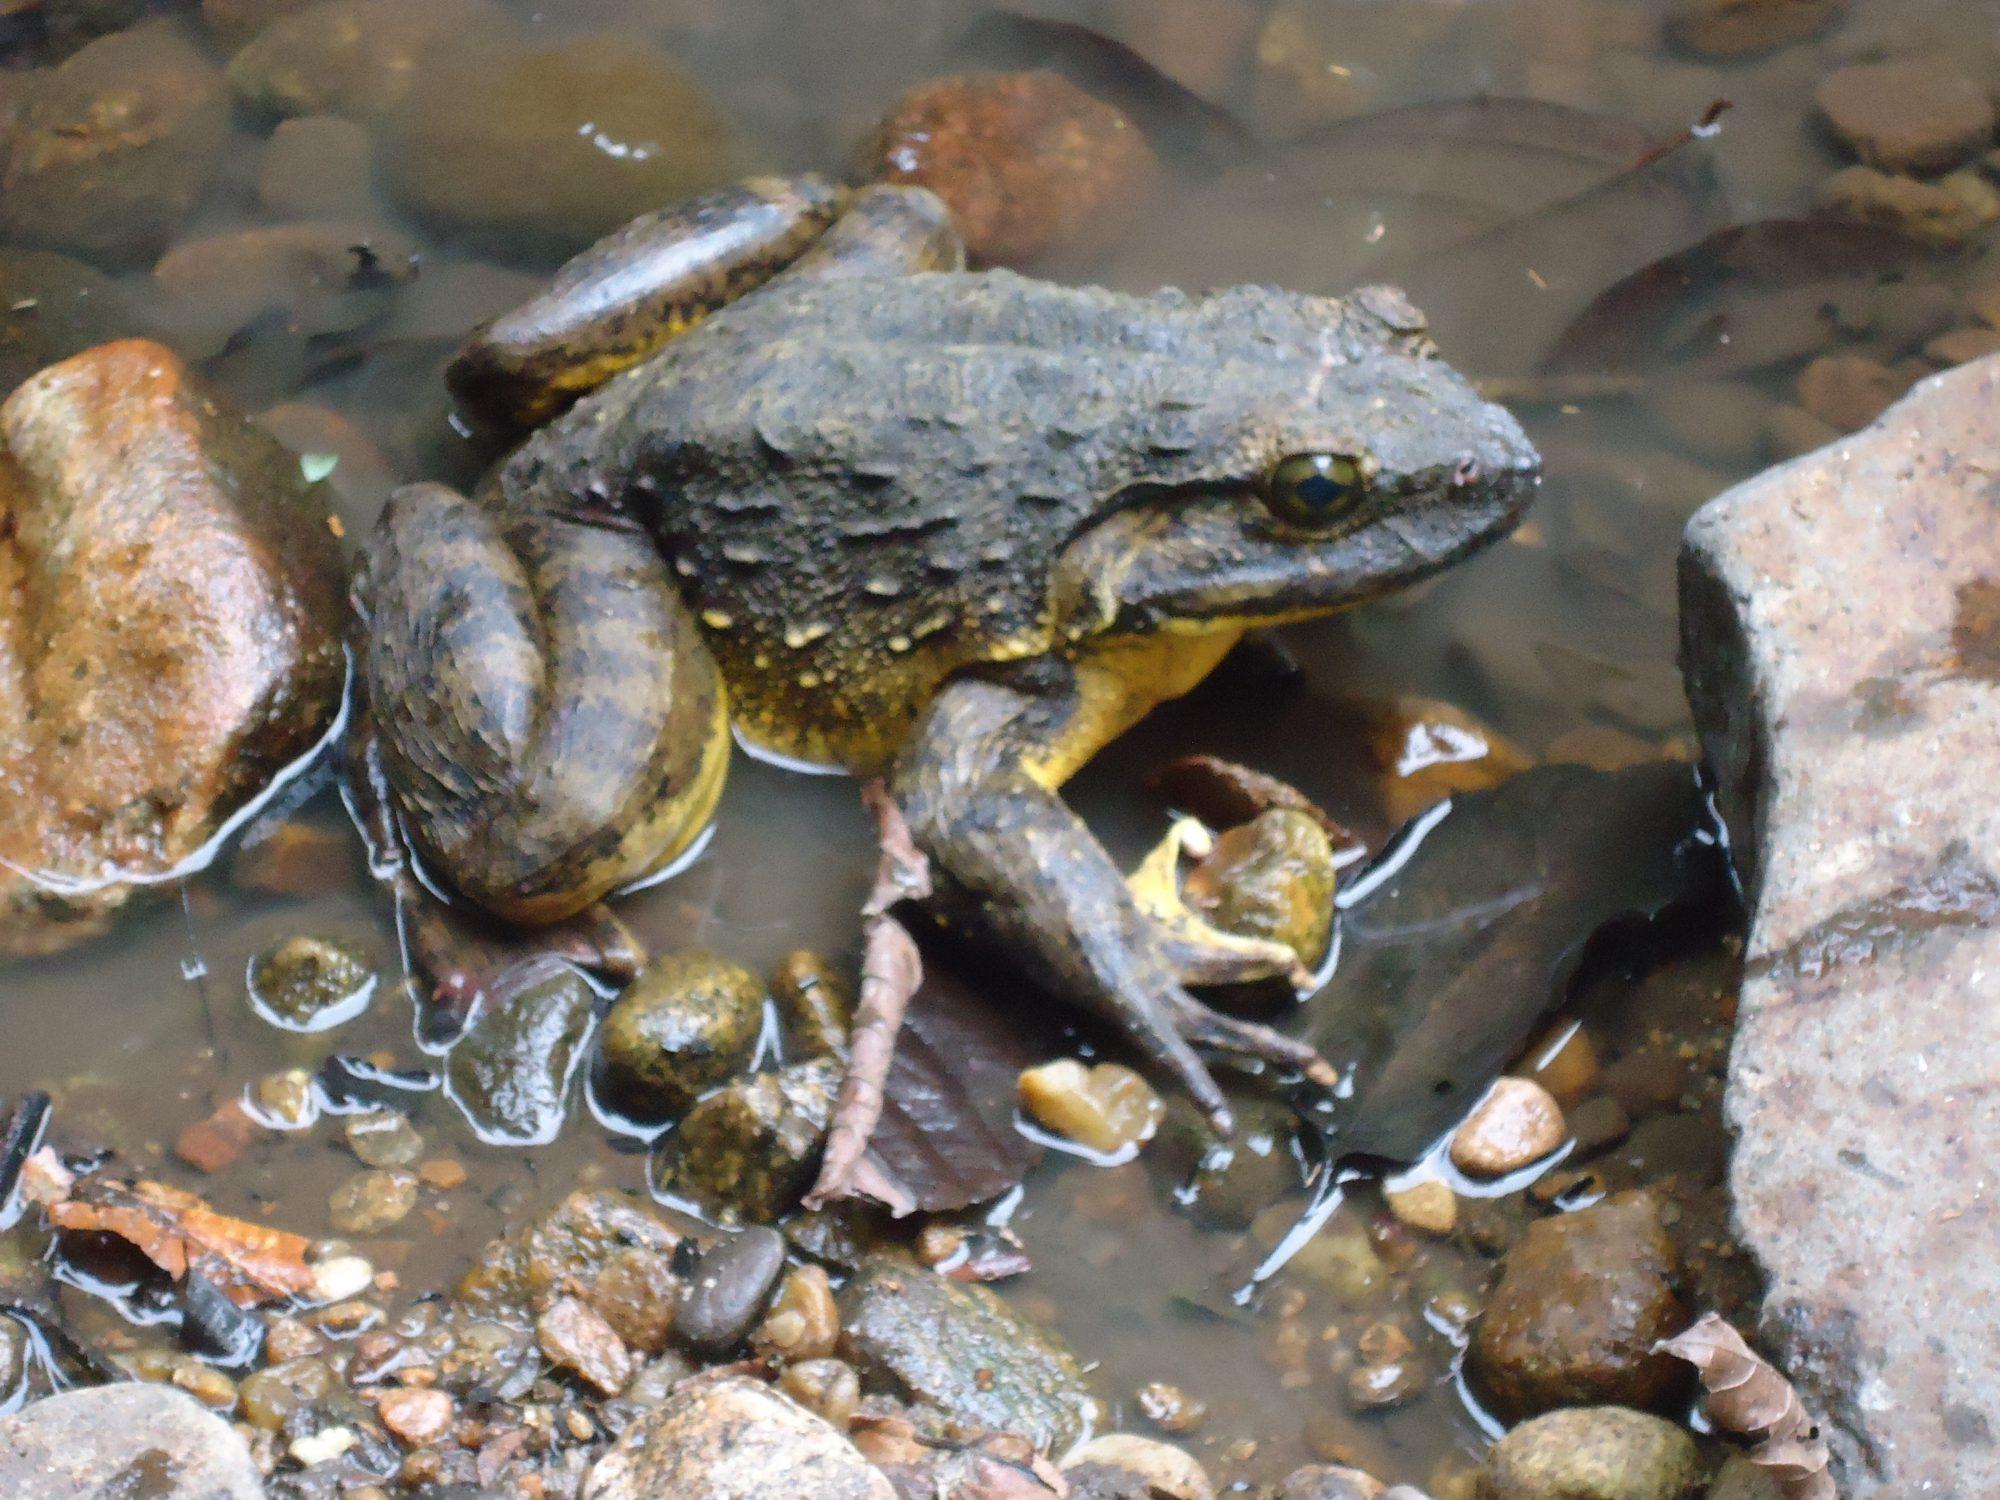 The Goliath frog Conraua goliath initiative